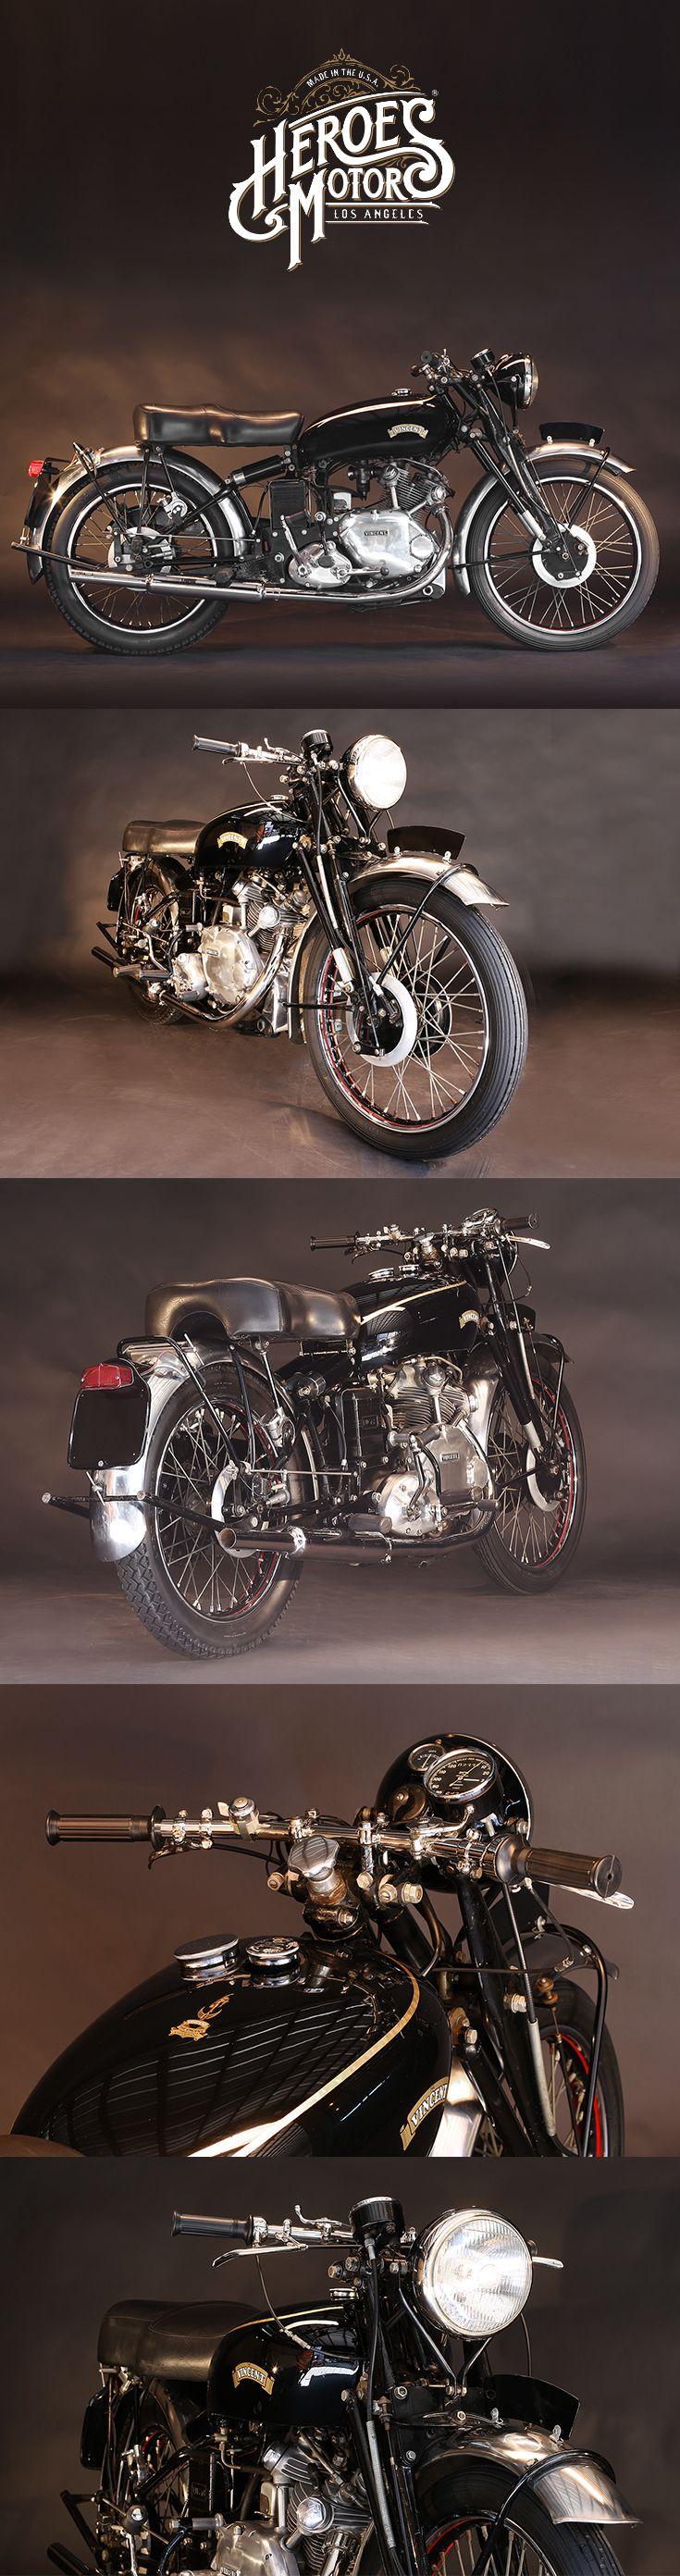 1951 VINCENT 500cc COMET #forsale #heroesmotors #caferacer #vintagemotorcycles #triumph #harleydavidson #losangeles #california #norton #vincent #indian #classicmotorcycles #ateliersbueno #photosergebueno